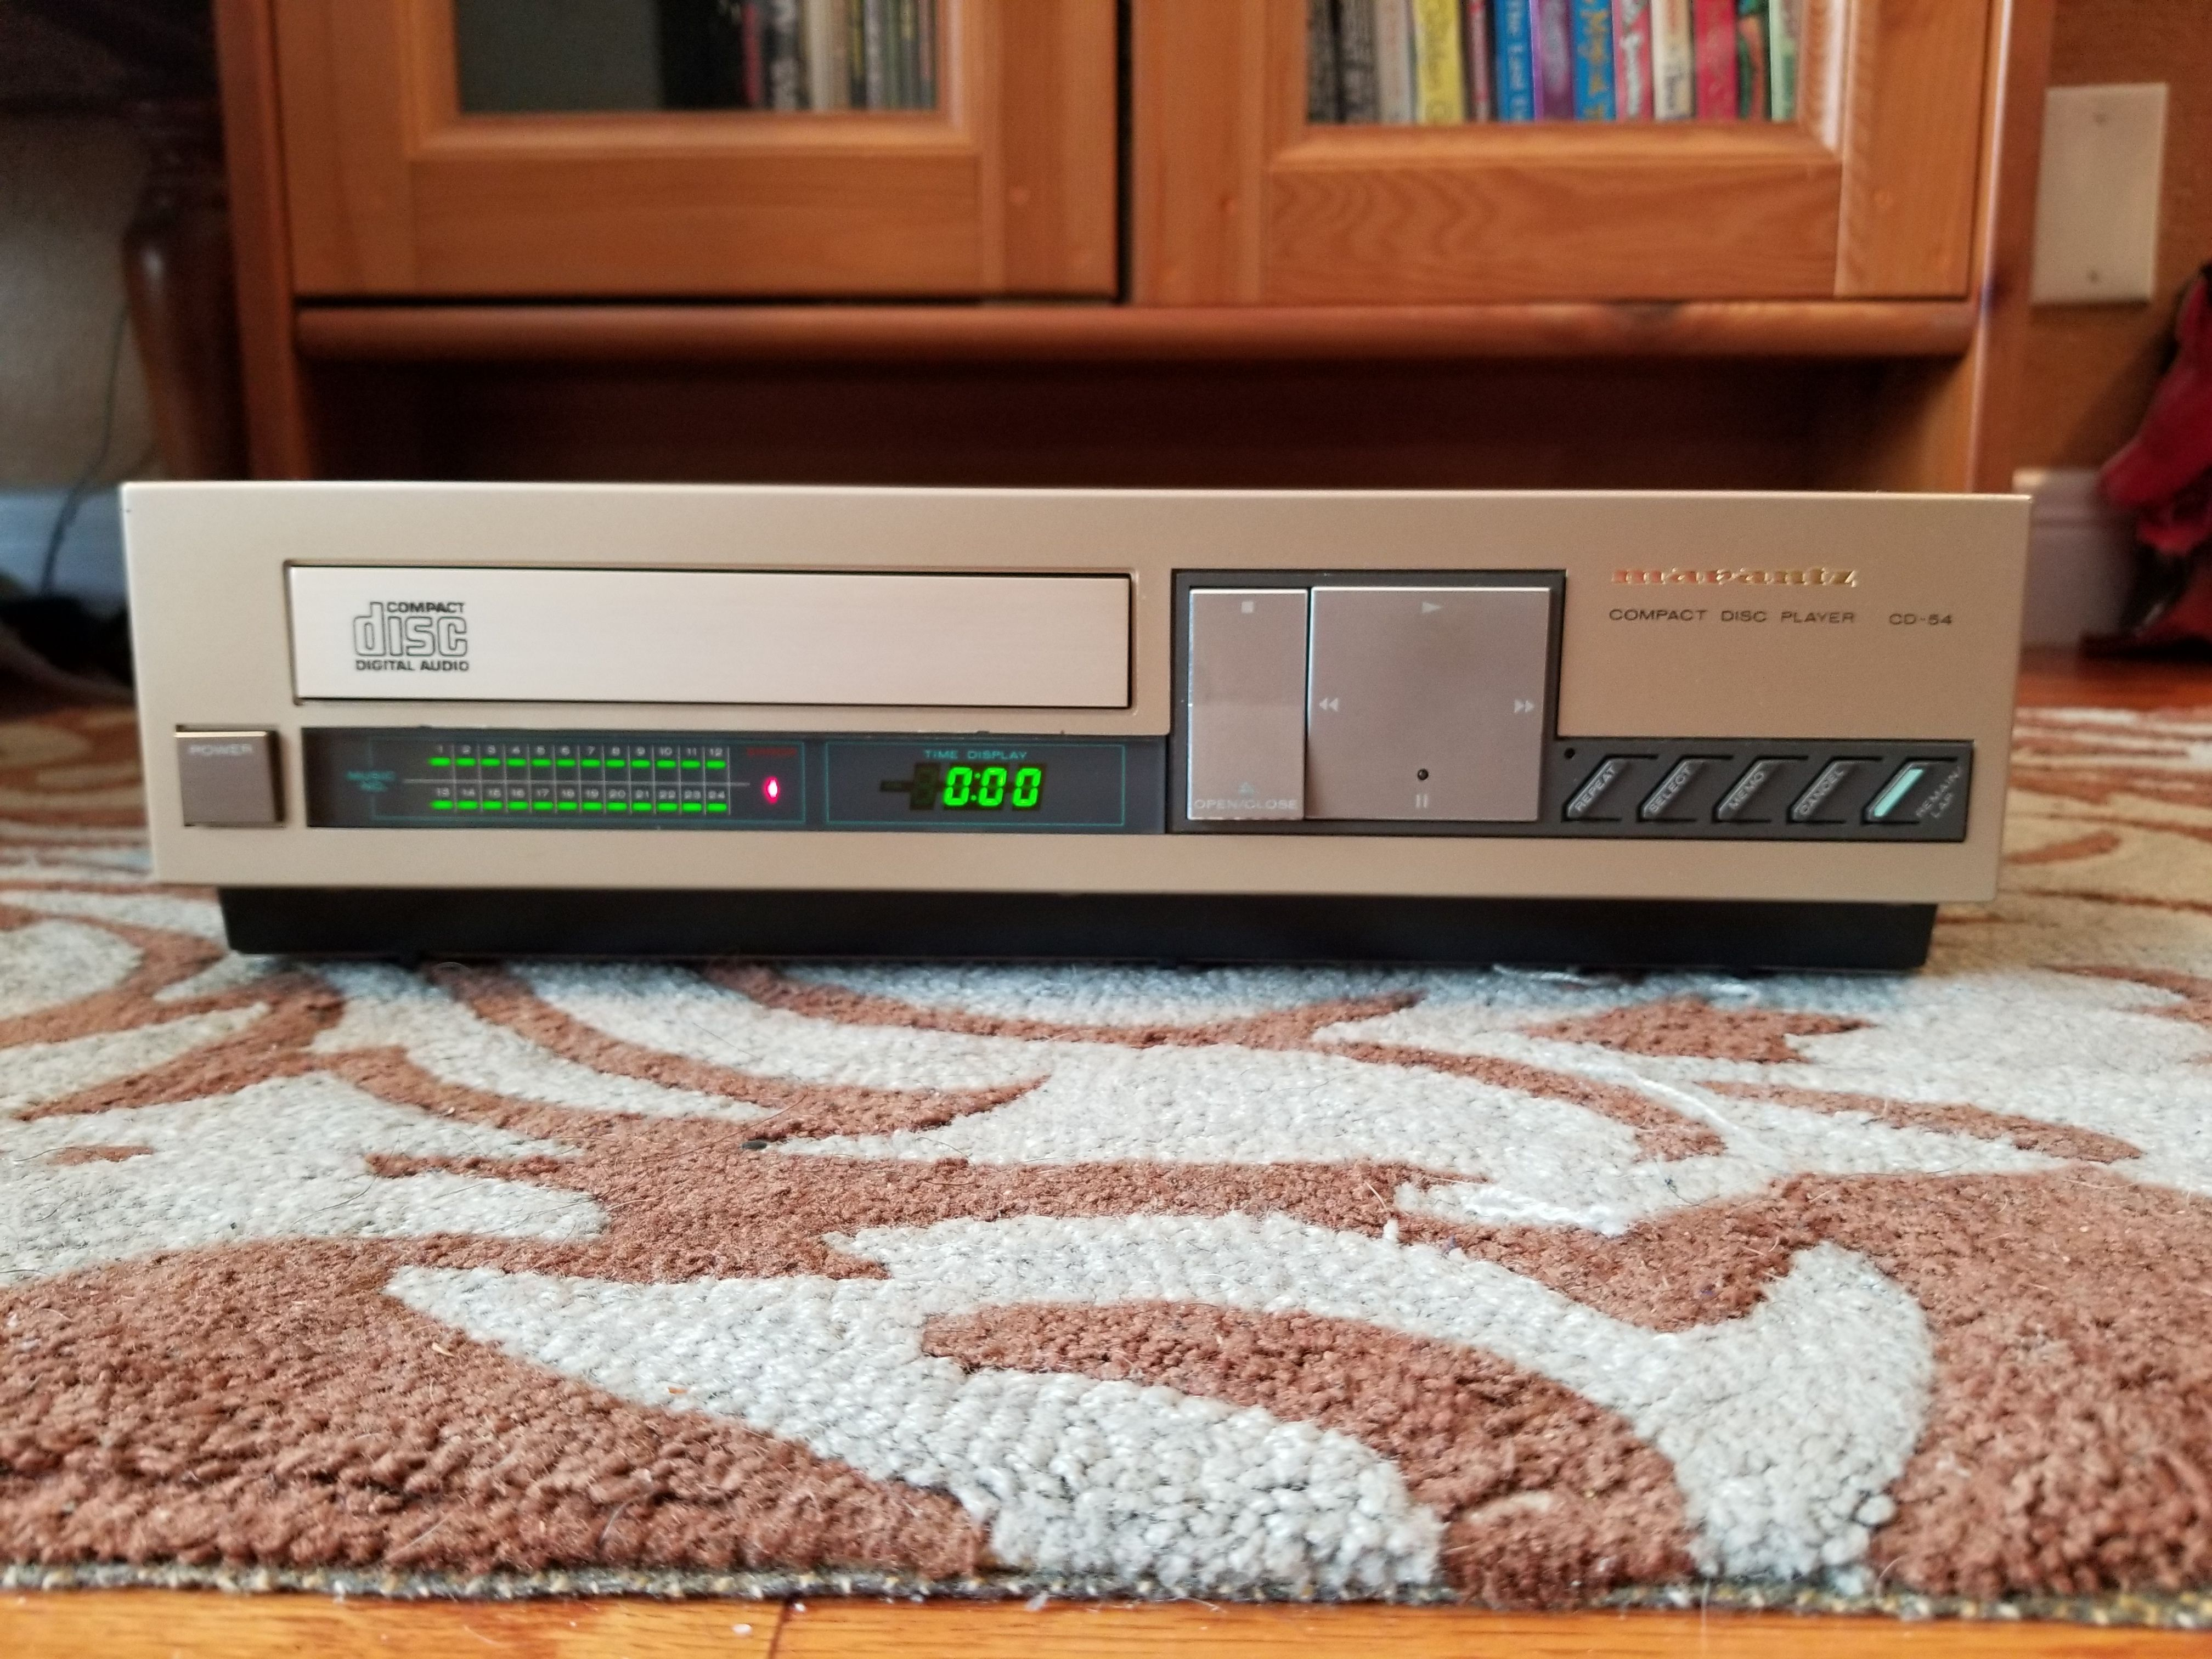 Marantz CD-54 Compact Disc Player